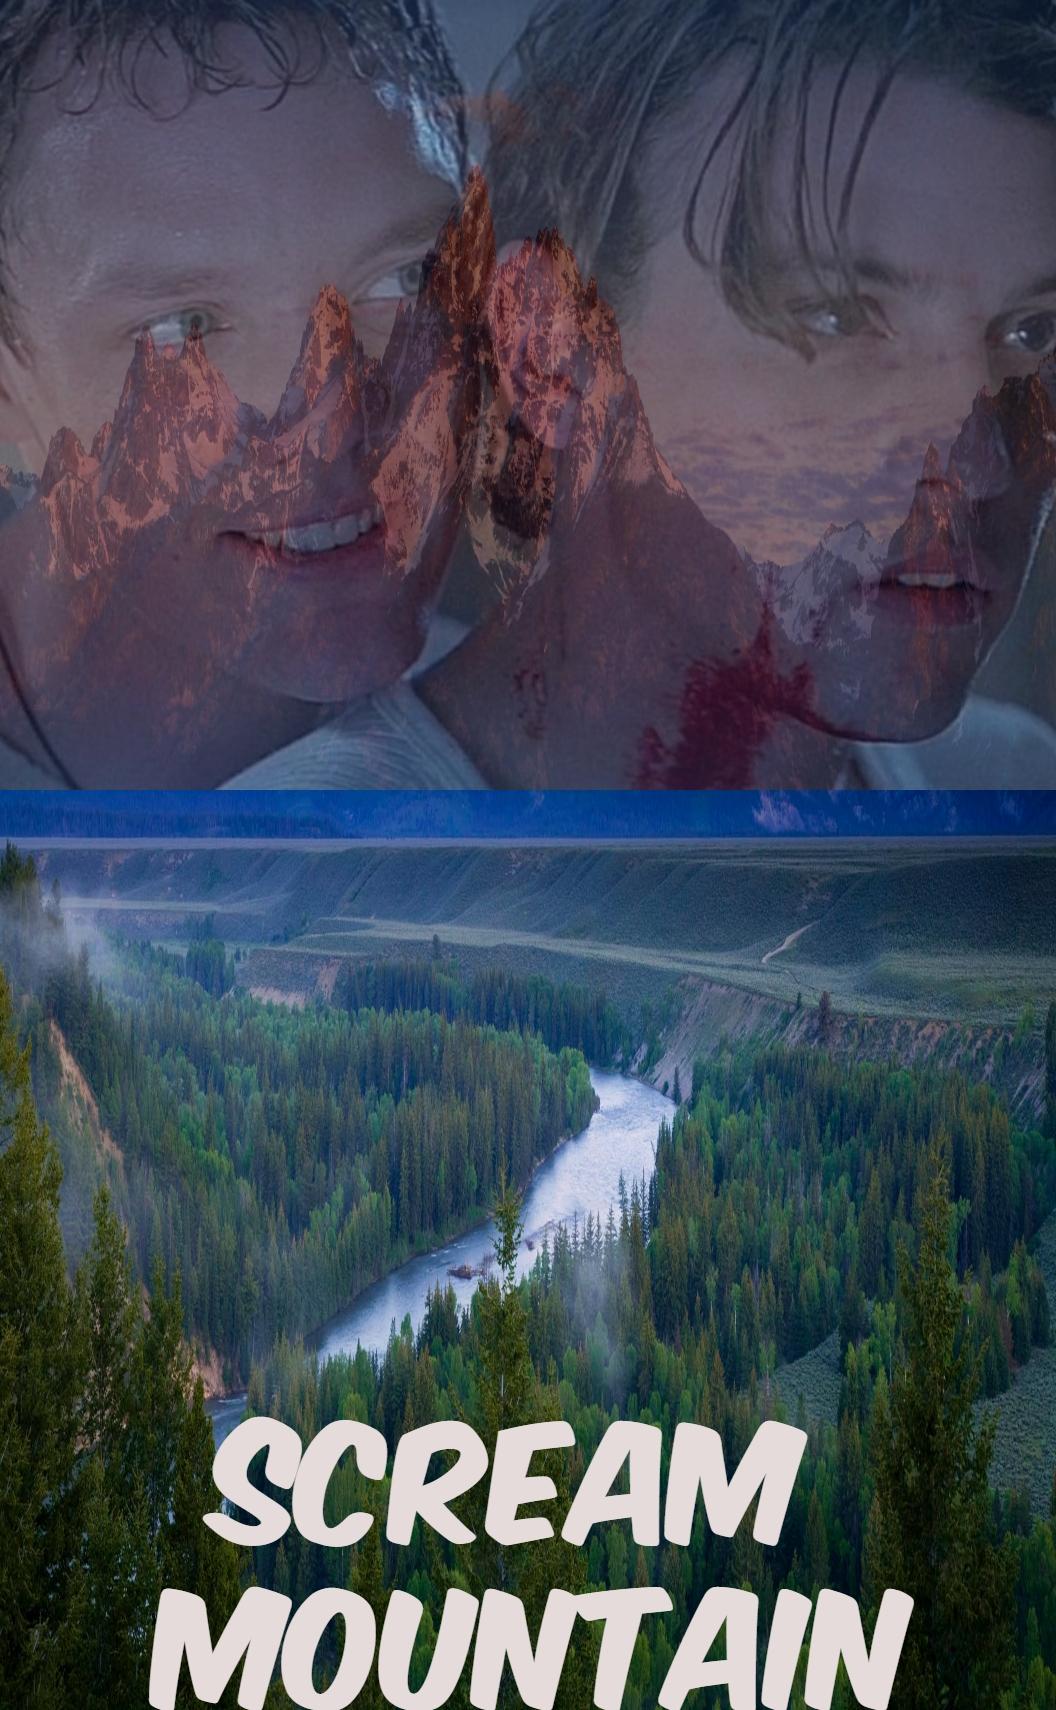 12dec8938220093eb7f1fdb8a9ce40b8-the-rocky-mountains (1).jpg